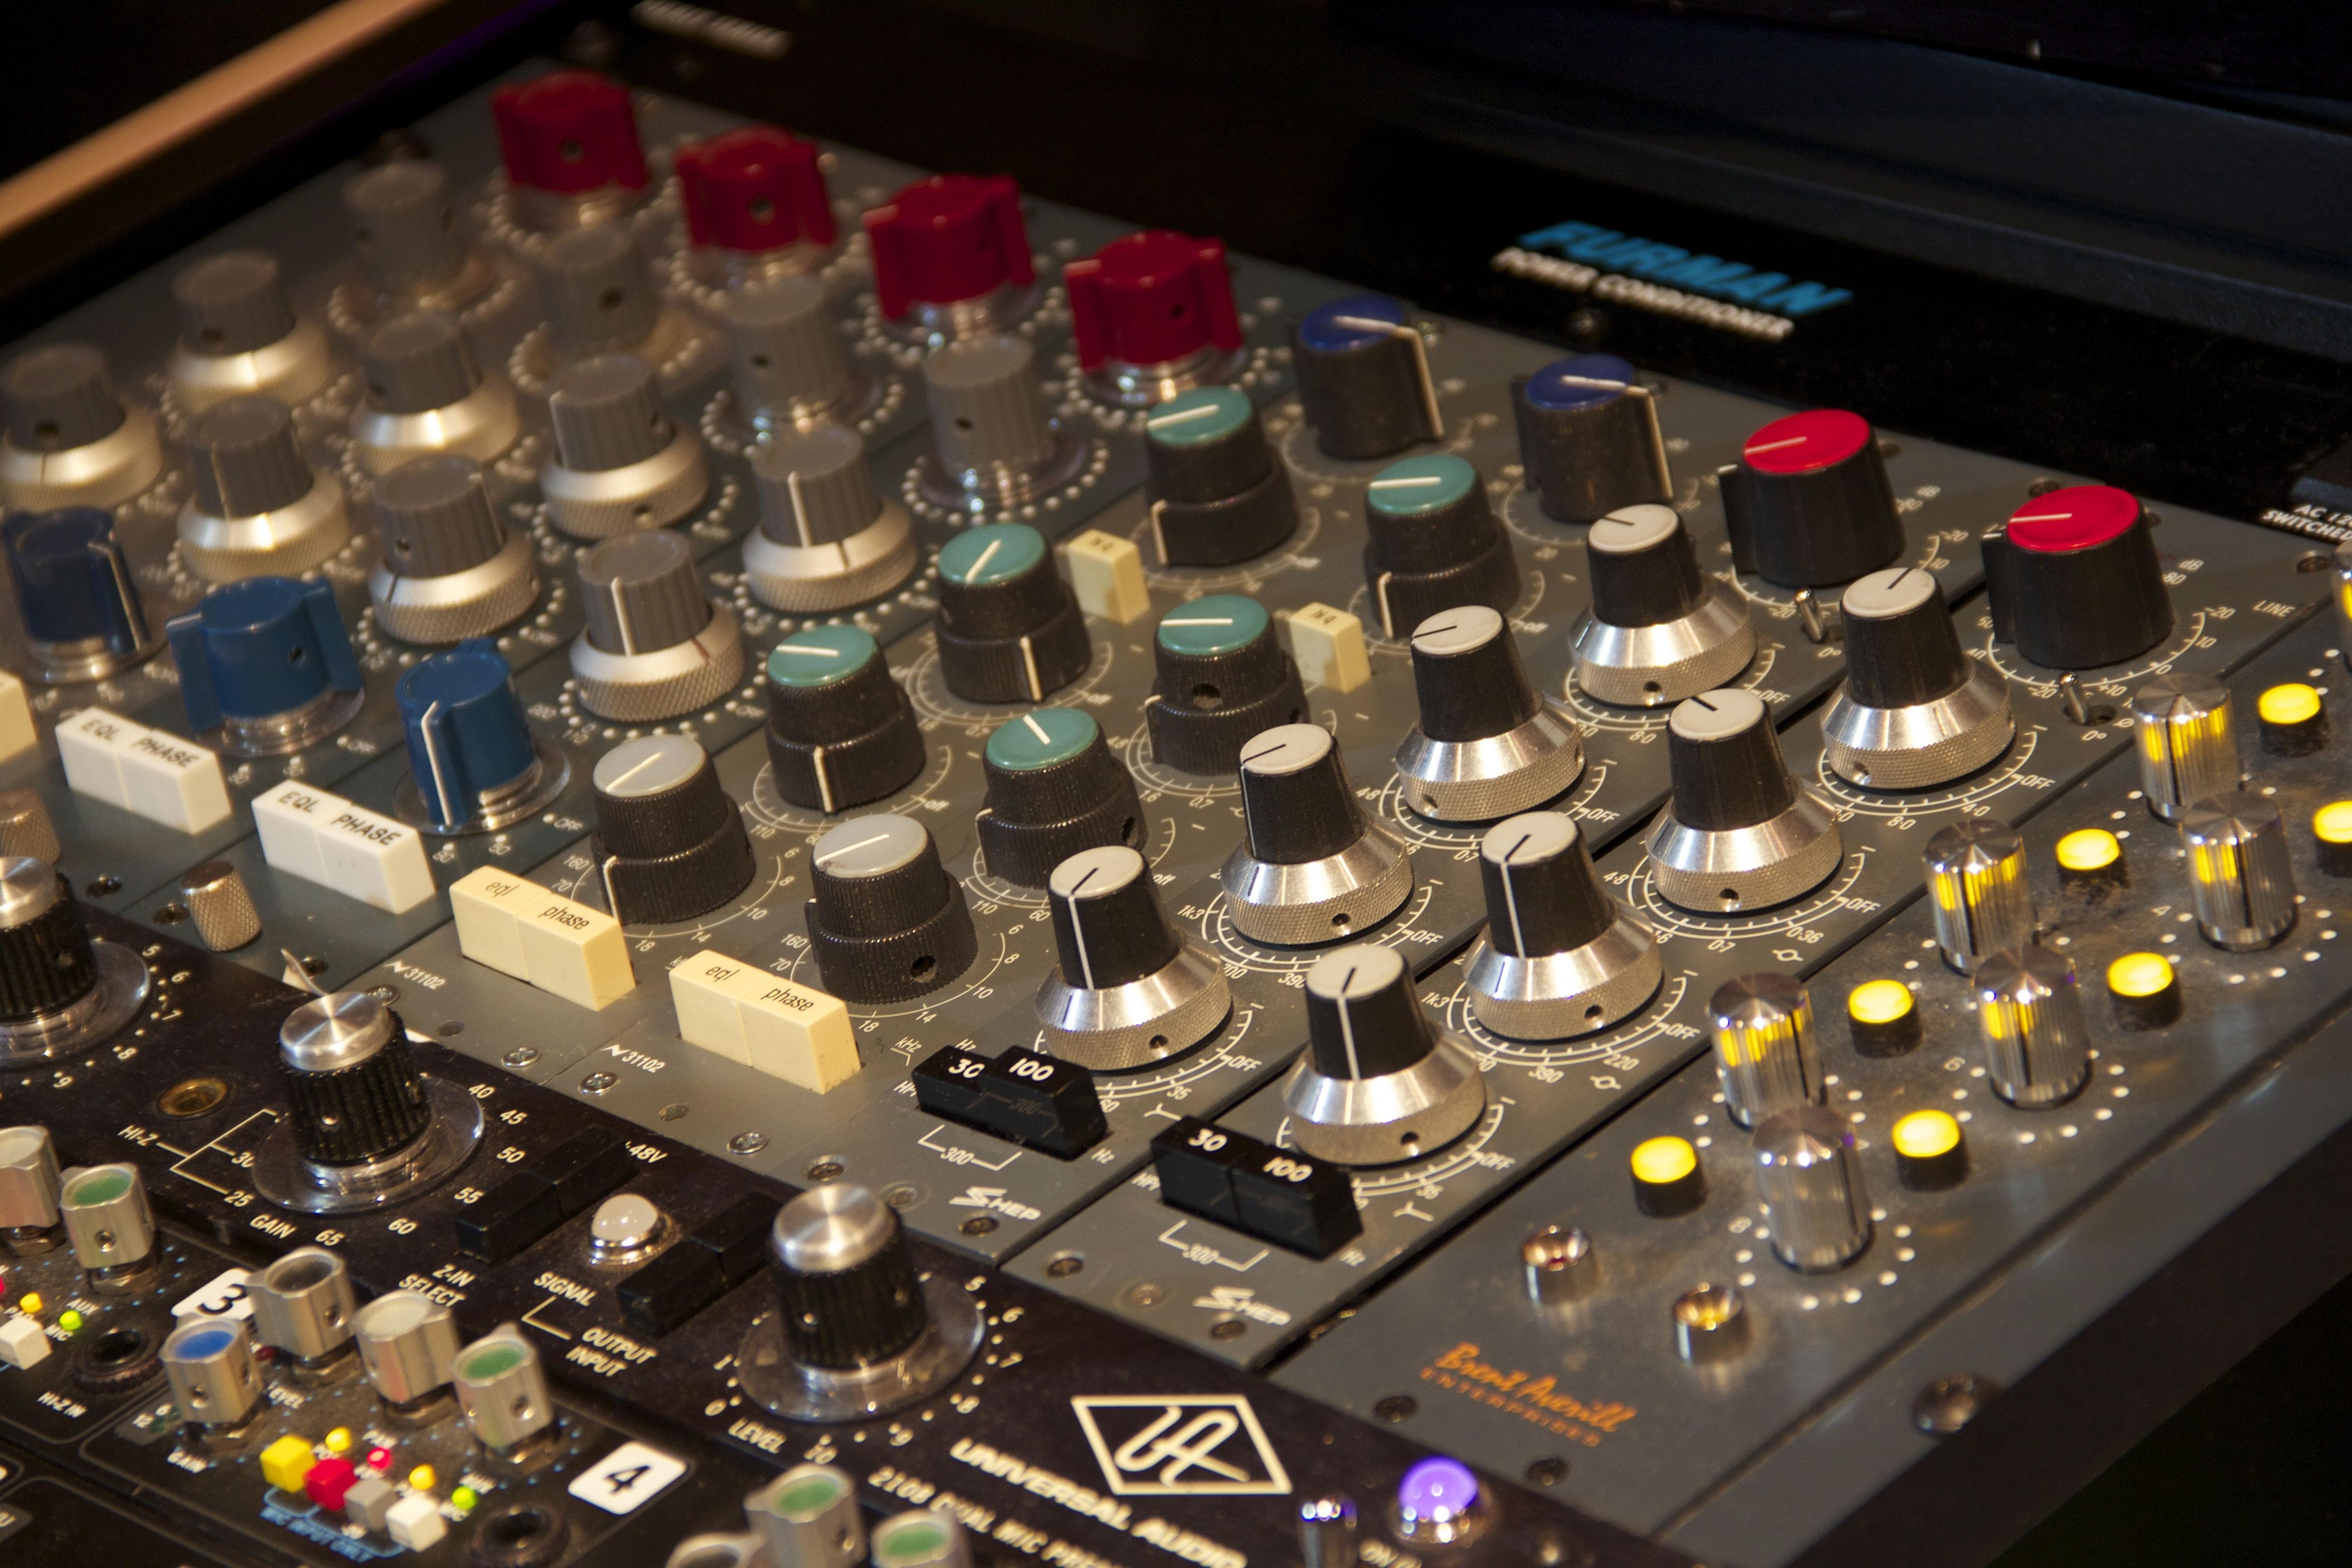 Synthesizer 5k Retina Ultra Hd Wallpaper Hintergrund 5200x3467